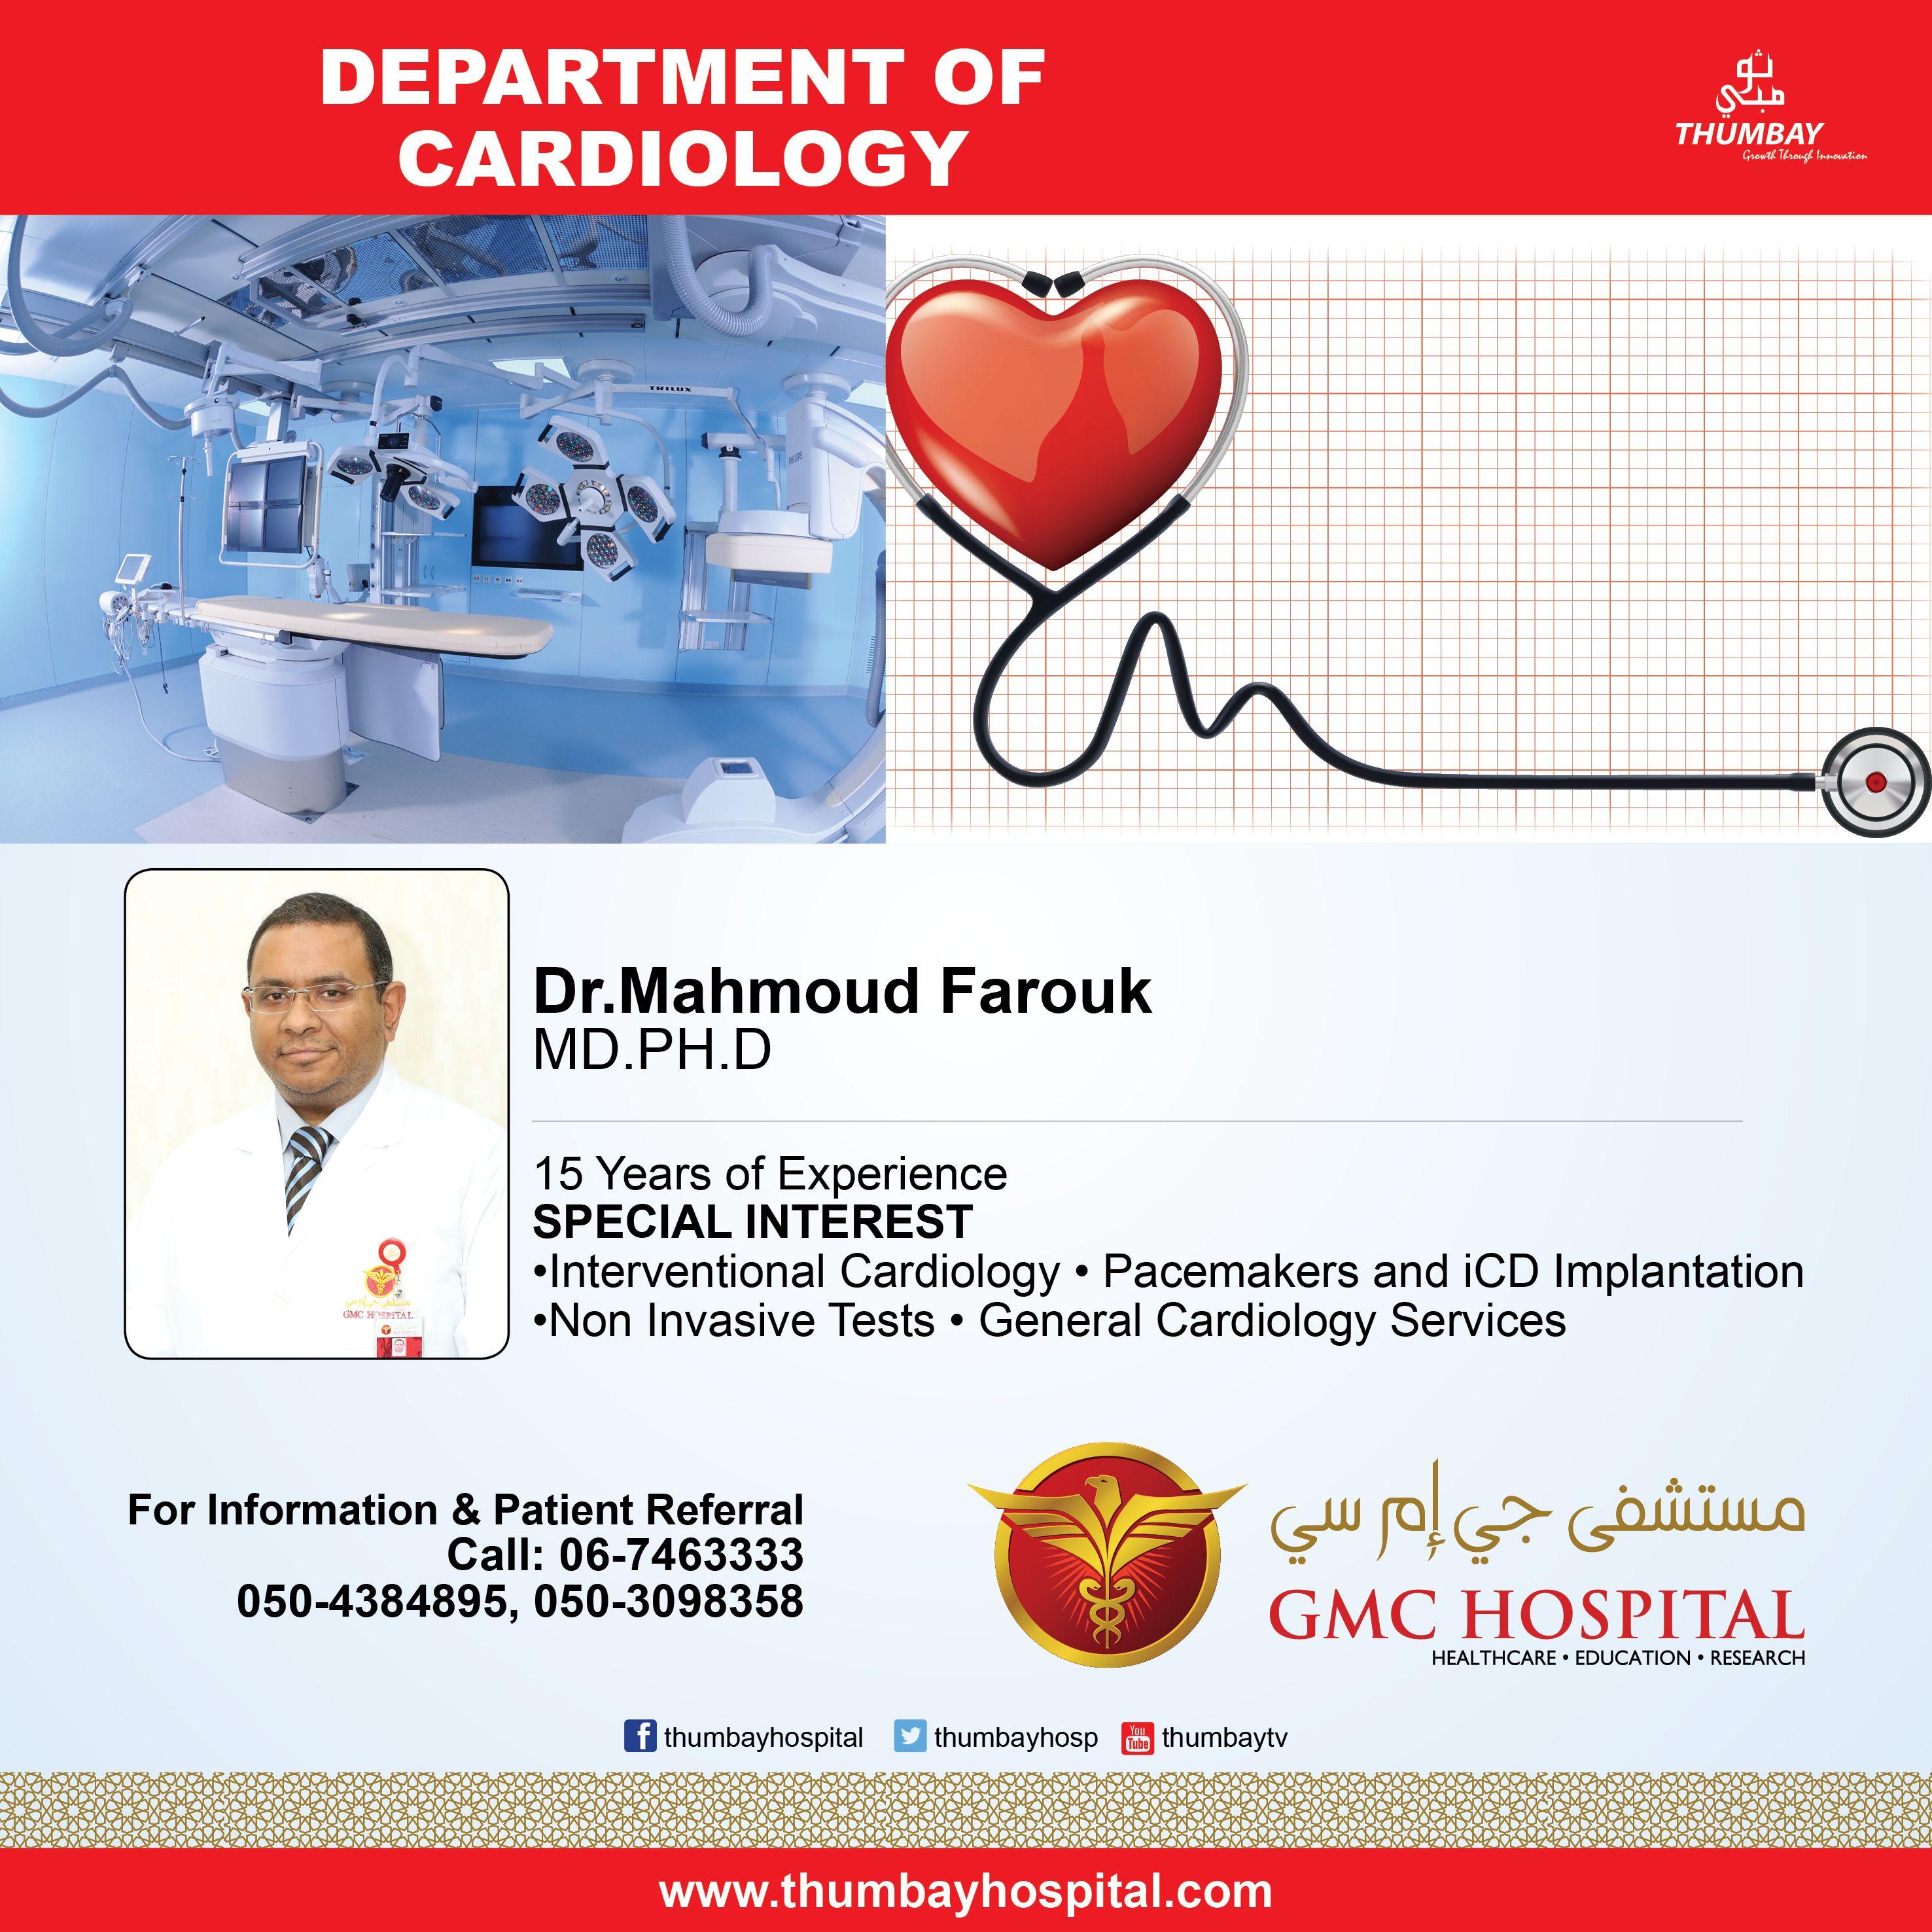 Meet Dr Mahmoud Farouk Cardiology Specialist At Gmc Hospital Ajman For Appointments Call 06 7463333 Healthcare Education Cardiology Health Care